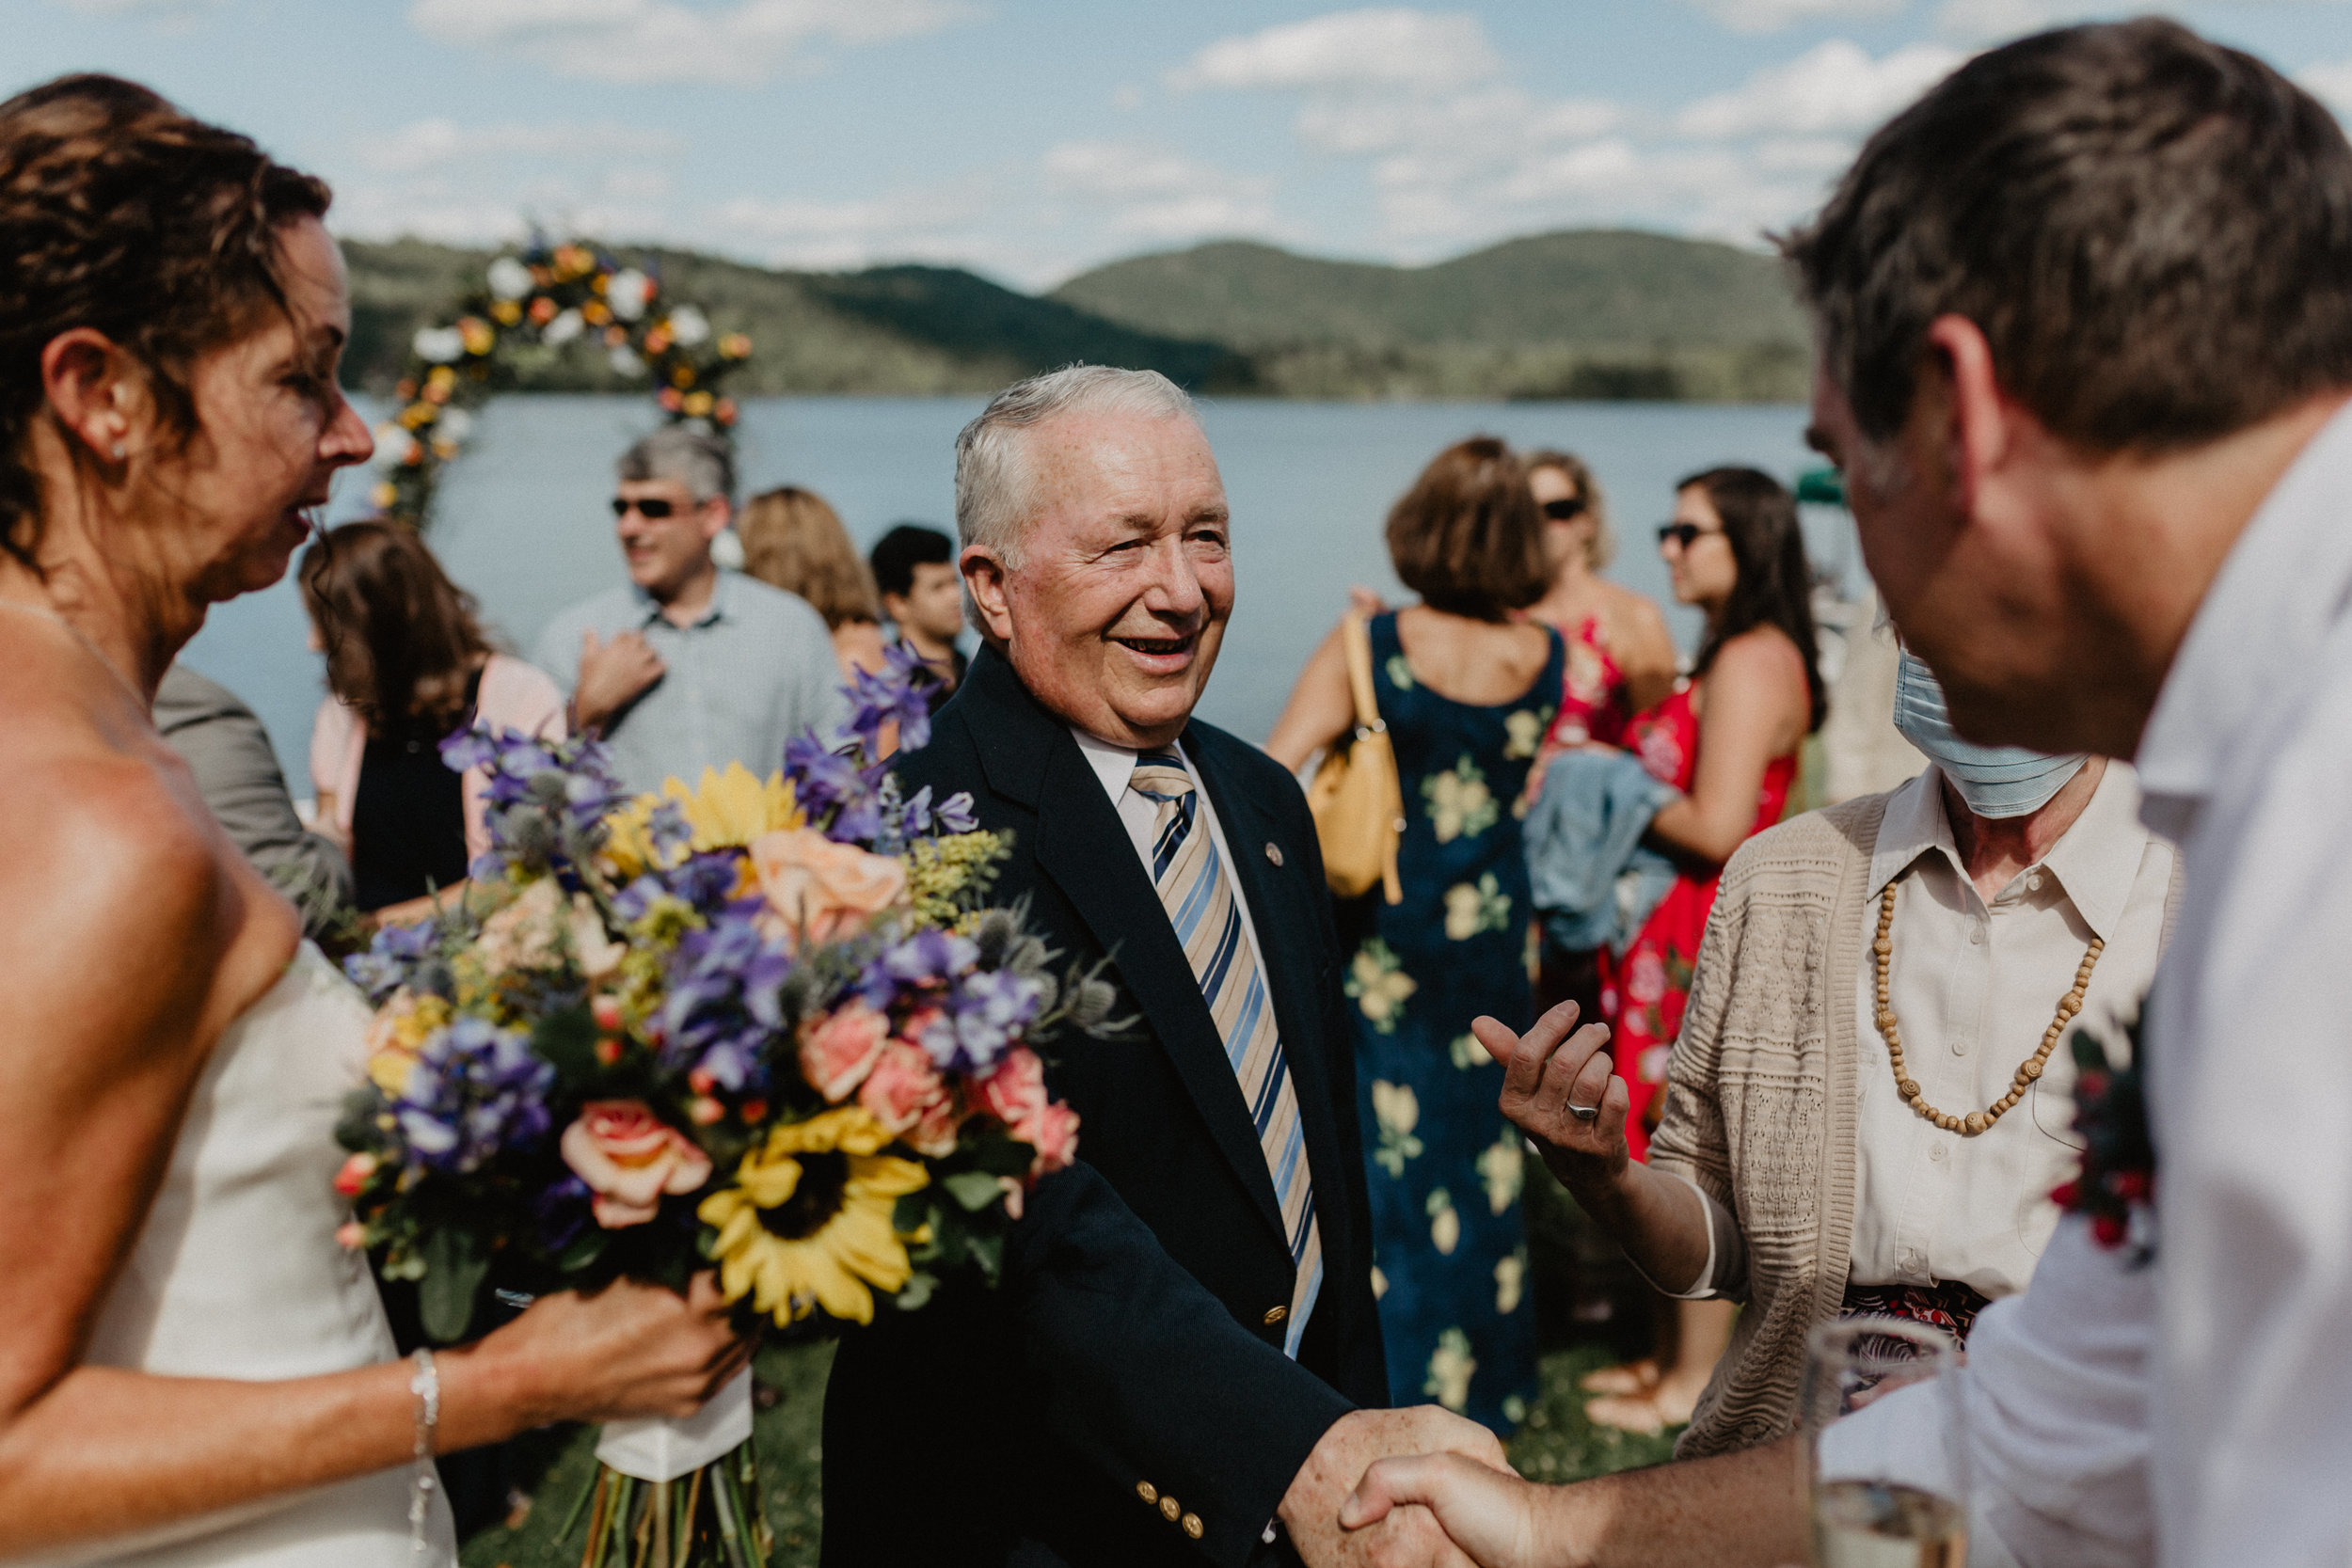 lake_placid_lodge_wedding_028.jpg